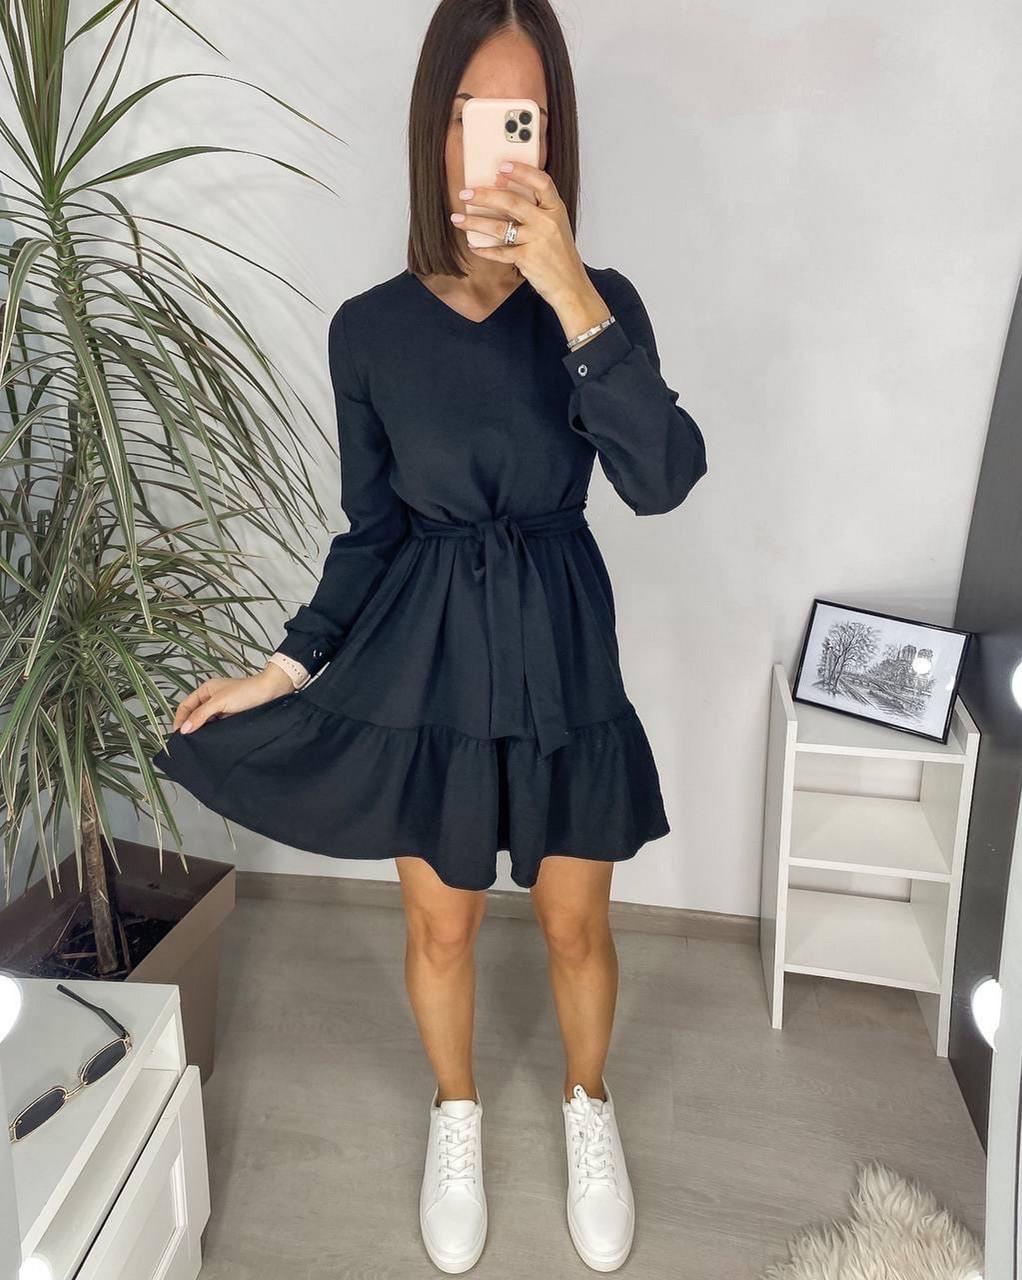 Свободне легке плаття з довгим рукавом креп-жатка, 00560 (Чорний), Размер 48 (XL)